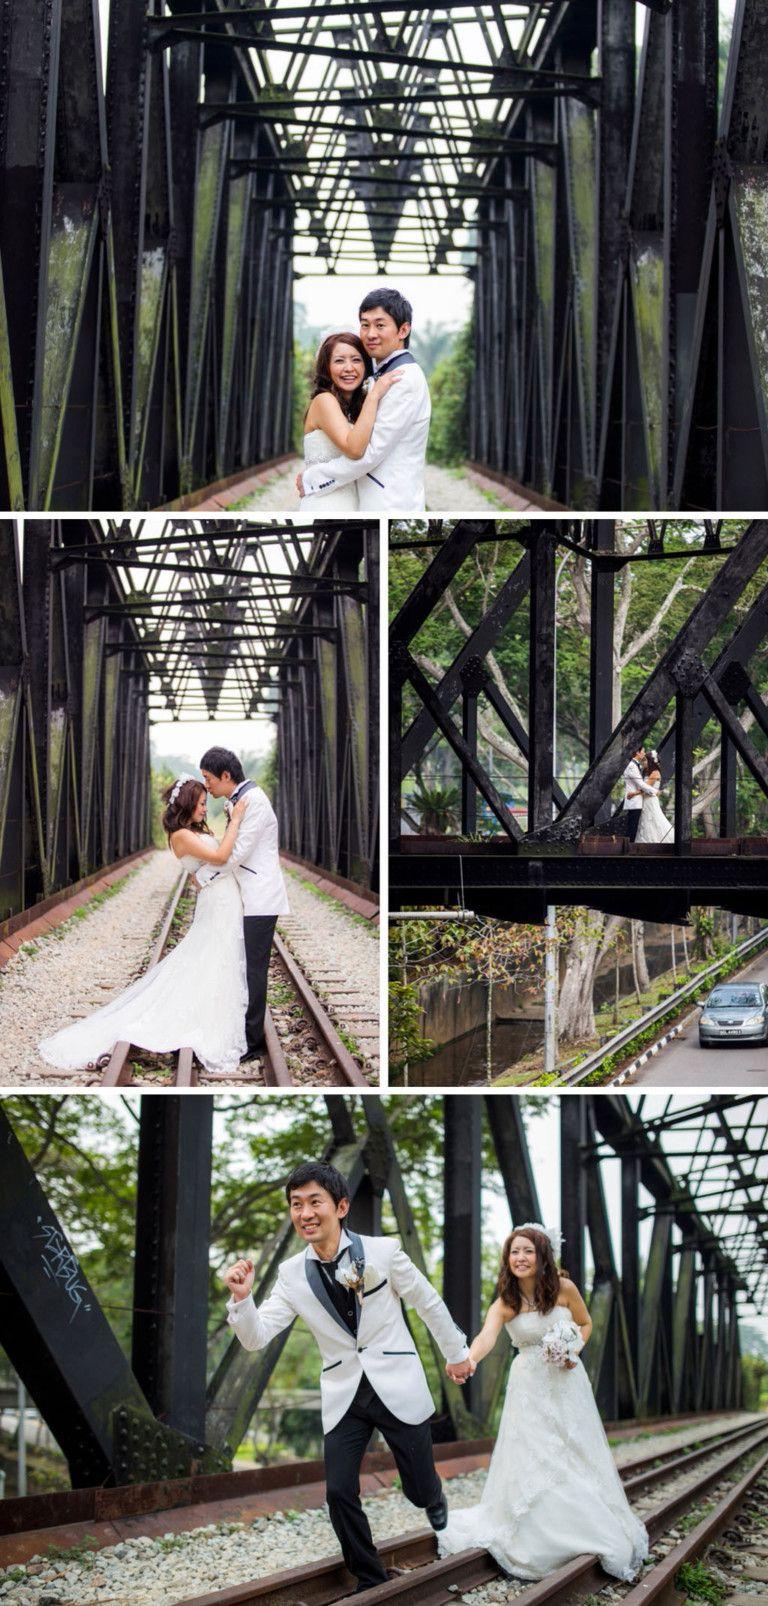 Top 10 Unique Singapore Pre Wedding Locations That